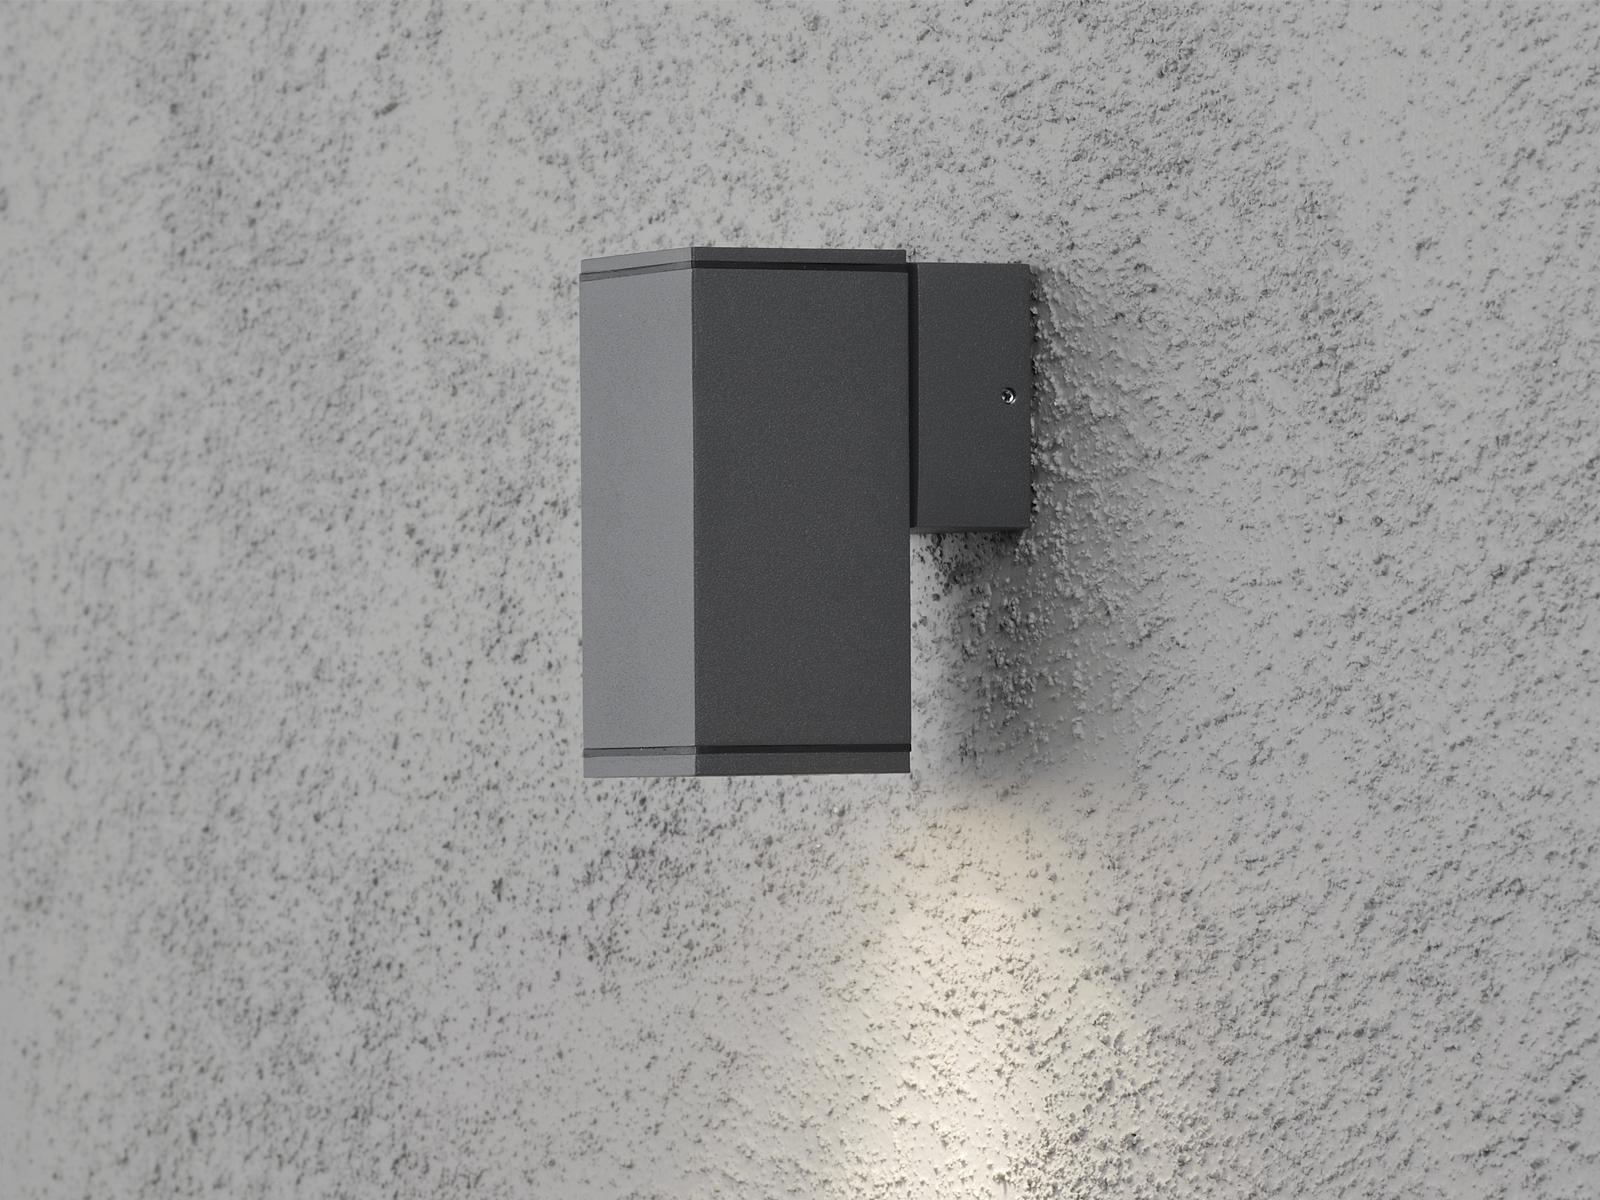 Aluminium Wandleuchte Wandlampe anthrazit GU10-Sockel H    13, 5cm IP44 Außenlampe 103551